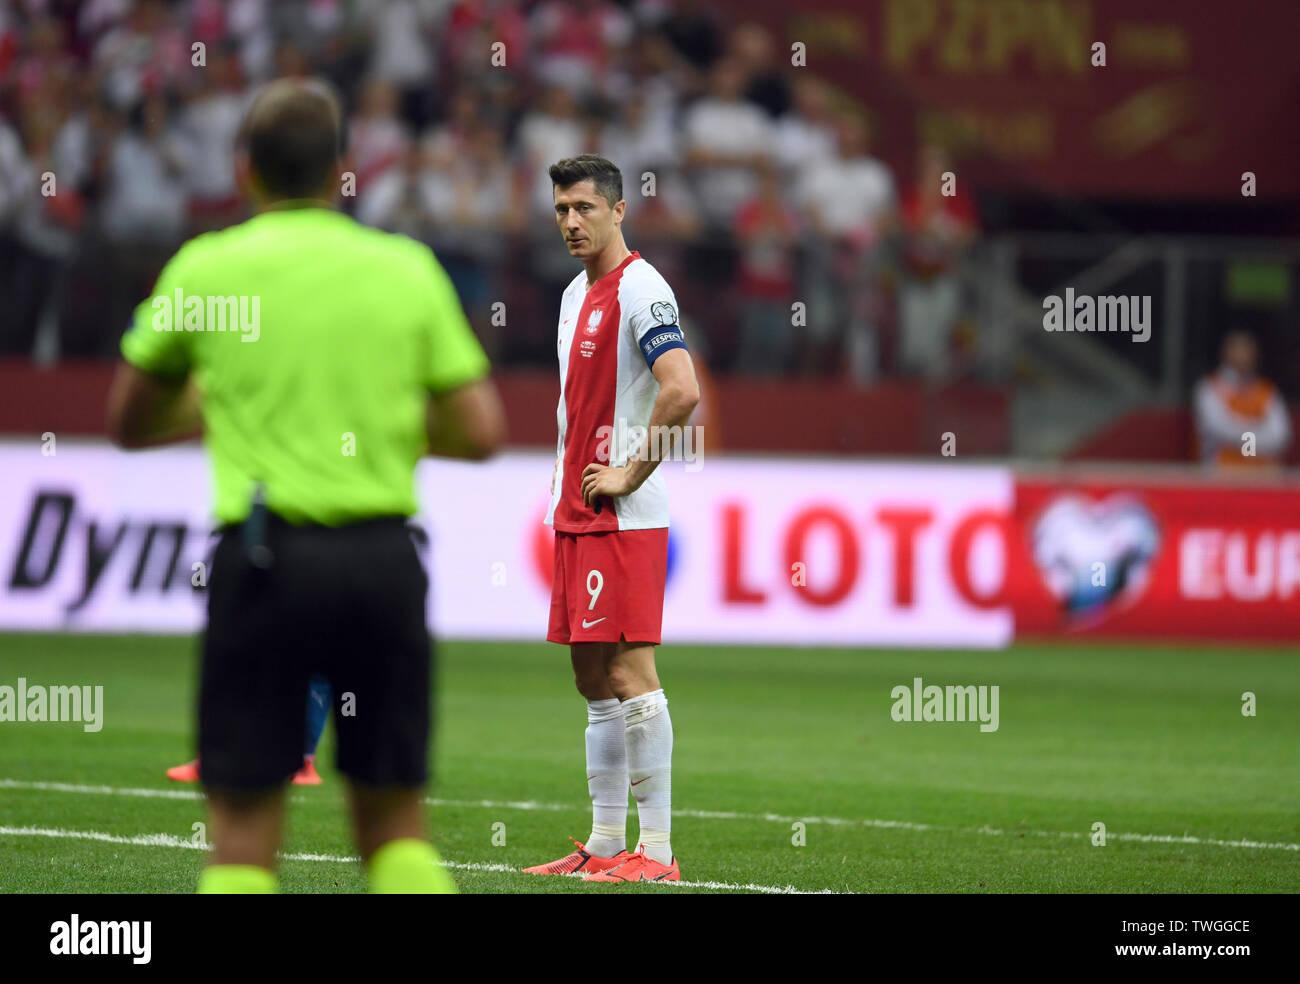 Warsaw, Poland, June 10, 2019: EURO 2020 qualifing round, group stage, Poland wins 4:0 with Izarel on PGE Narodowy. Robert Lewandowski (Poland)  is waiting to make a penalty shot - Stock Image